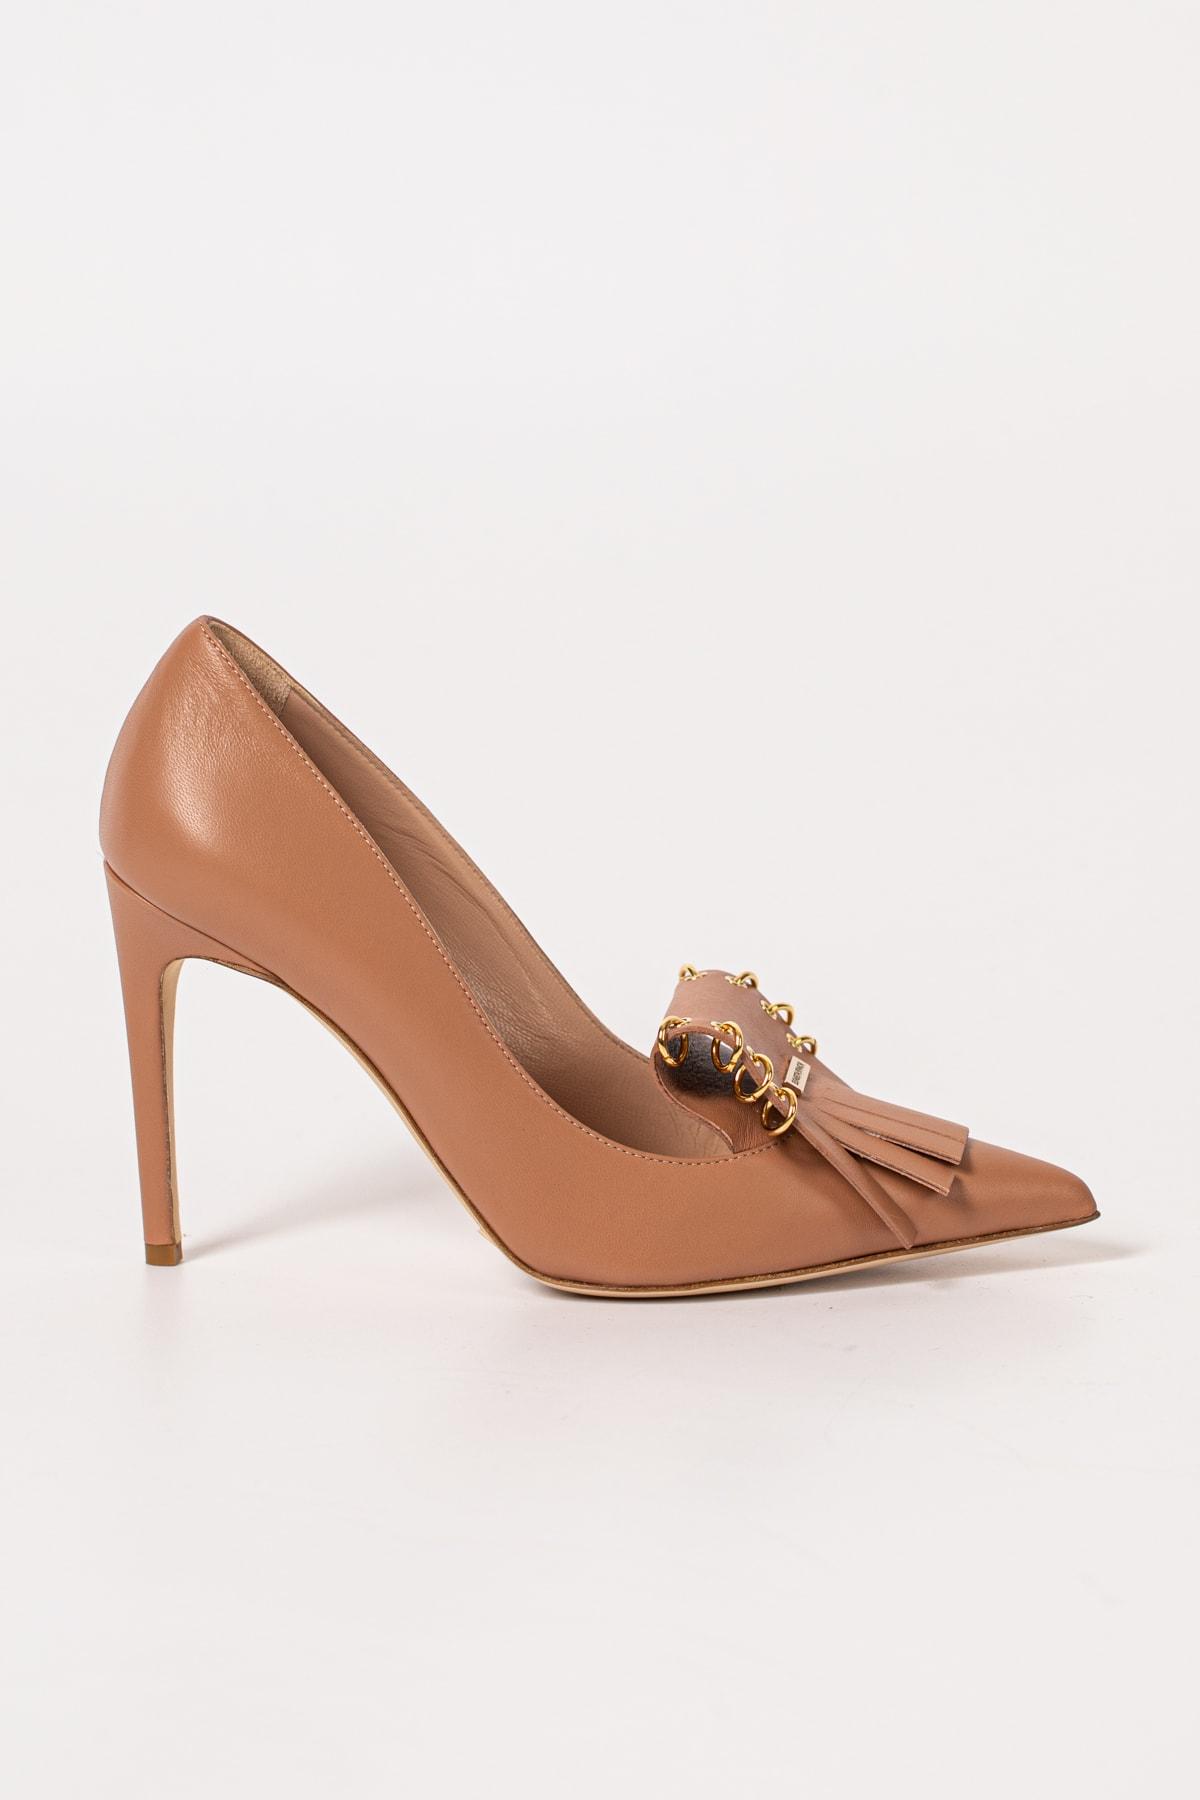 Elisabetta Franchi High-heeled shoe